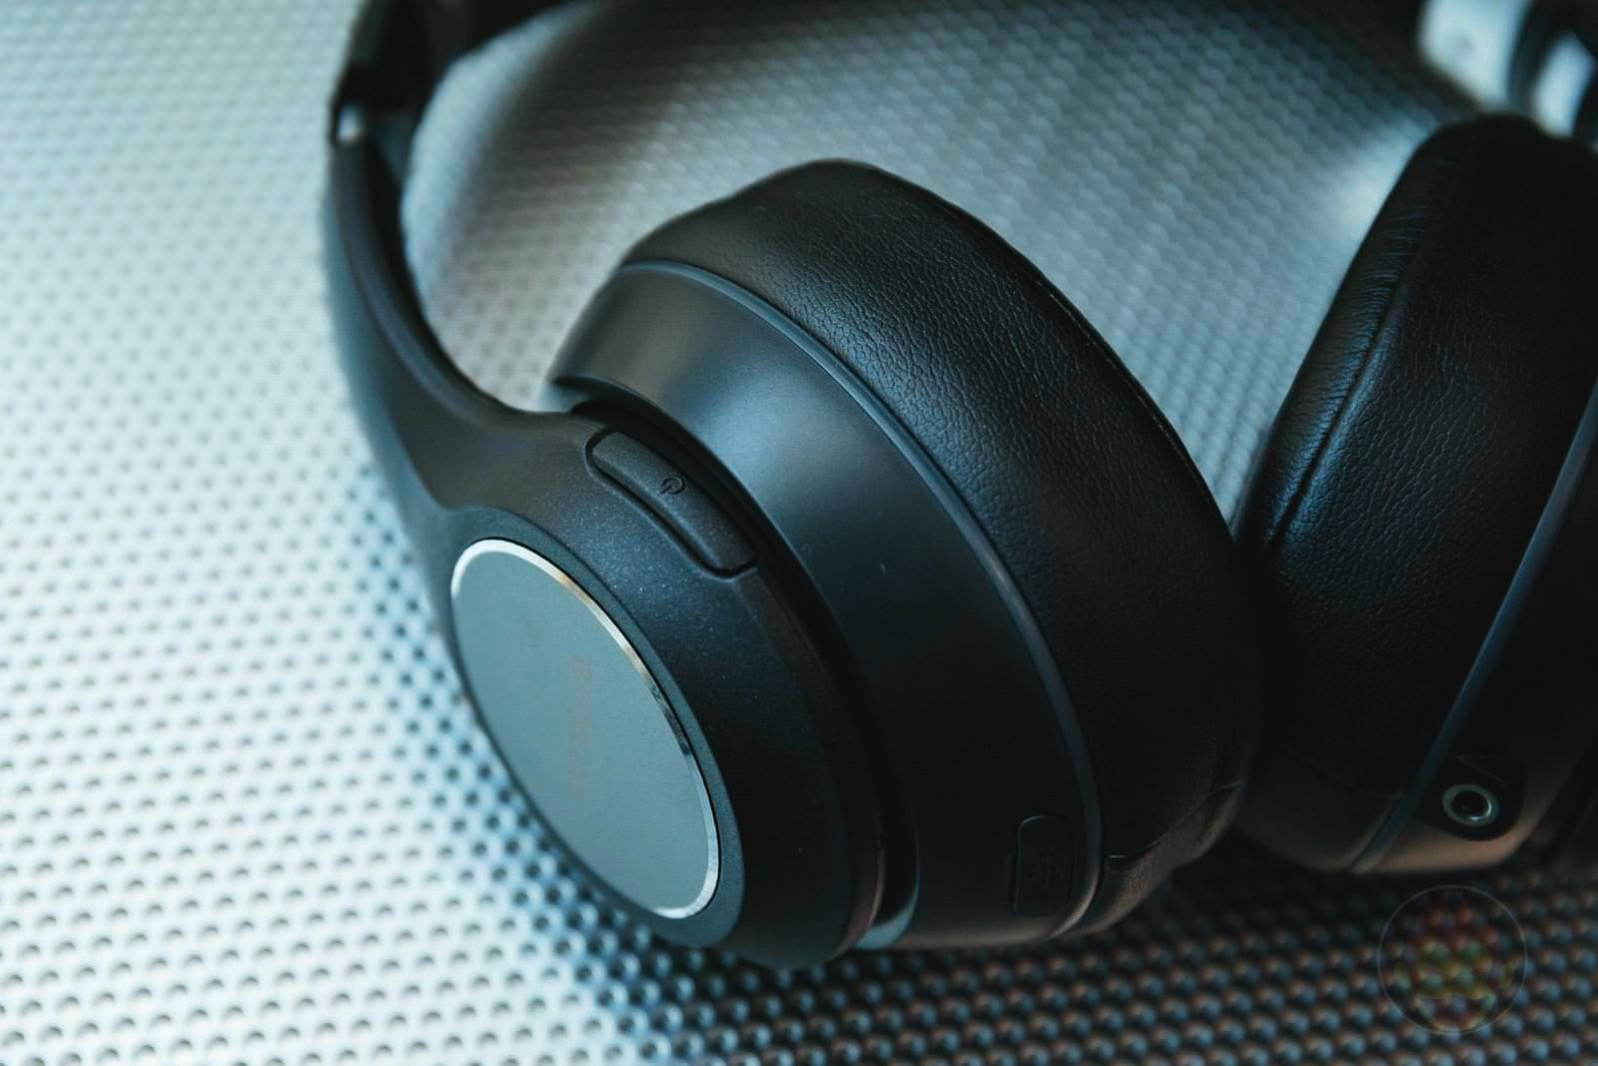 Soundcore-Vortex-Wireless-Headphones-13.jpg